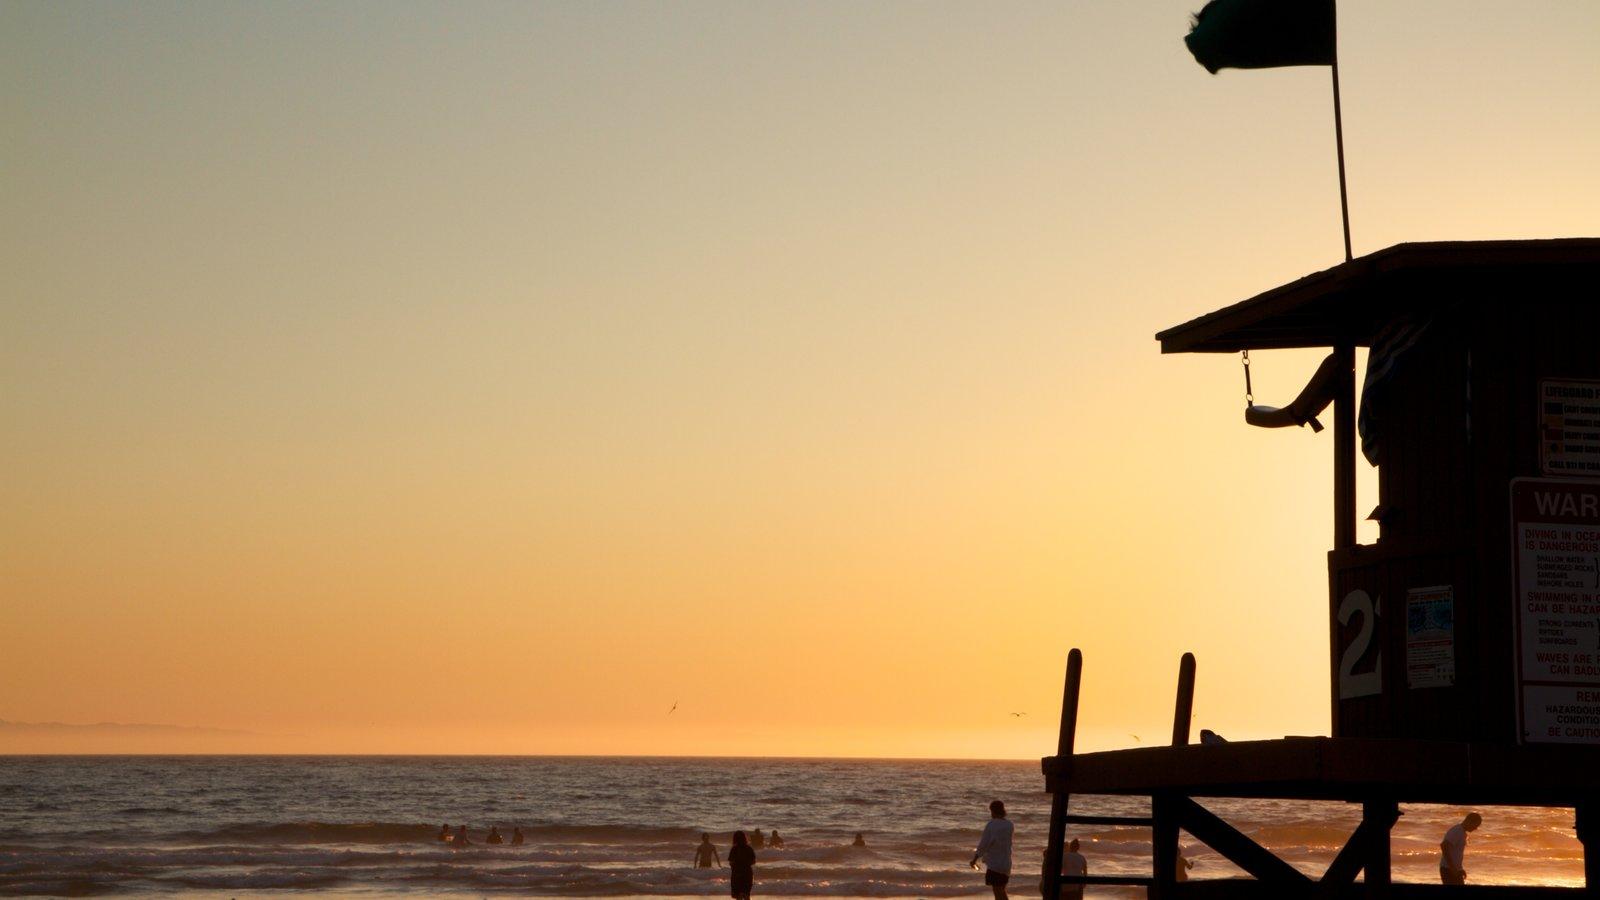 Newport Beach showing a beach, general coastal views and a sunset